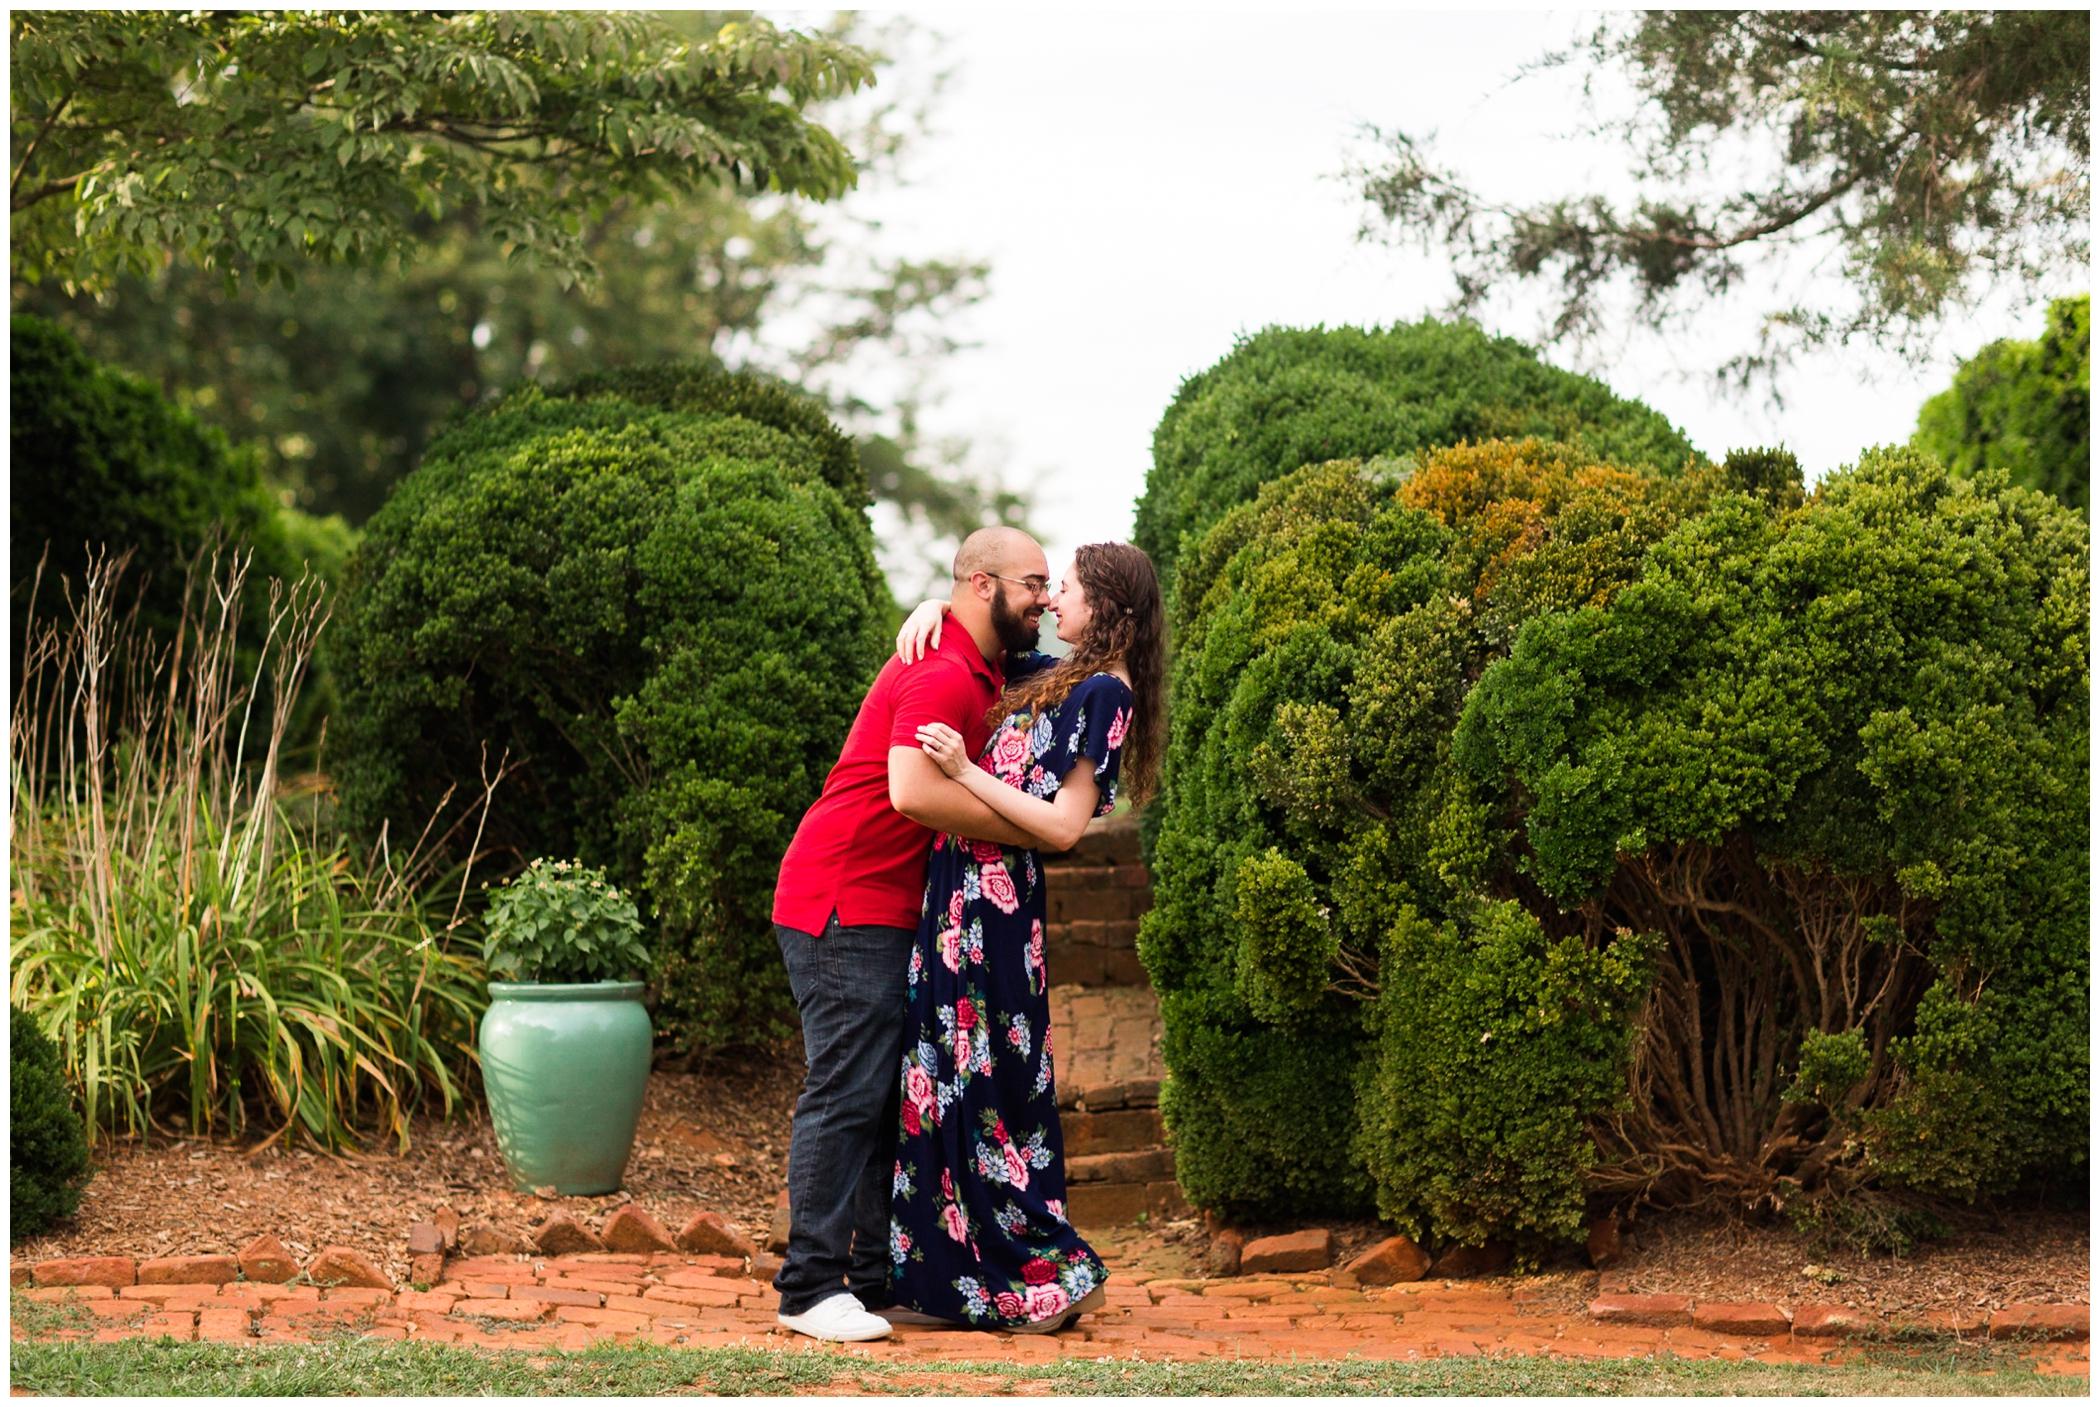 Summer engagement session at James Monroe's Highland with Virginia wedding photographer Hannah Joy